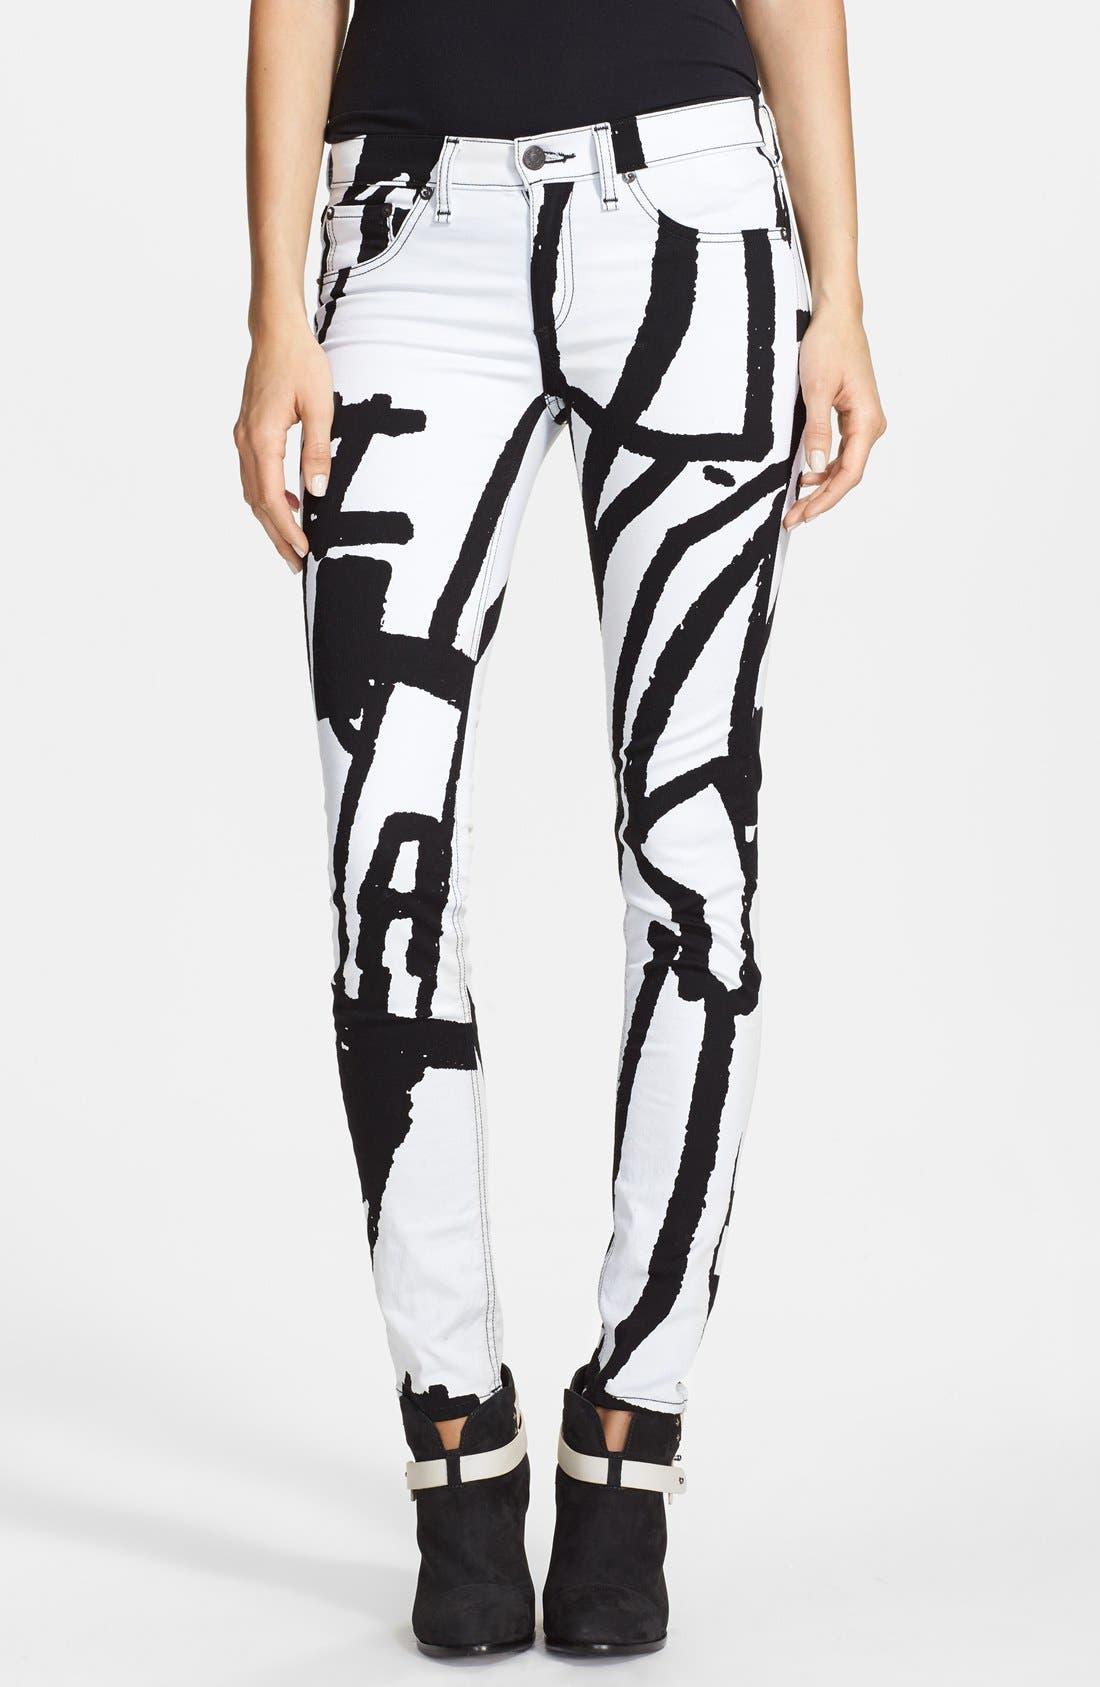 Main Image - rag & bone/JEAN 'The Legging' Graphic Print Skinny Jeans (White Robot)